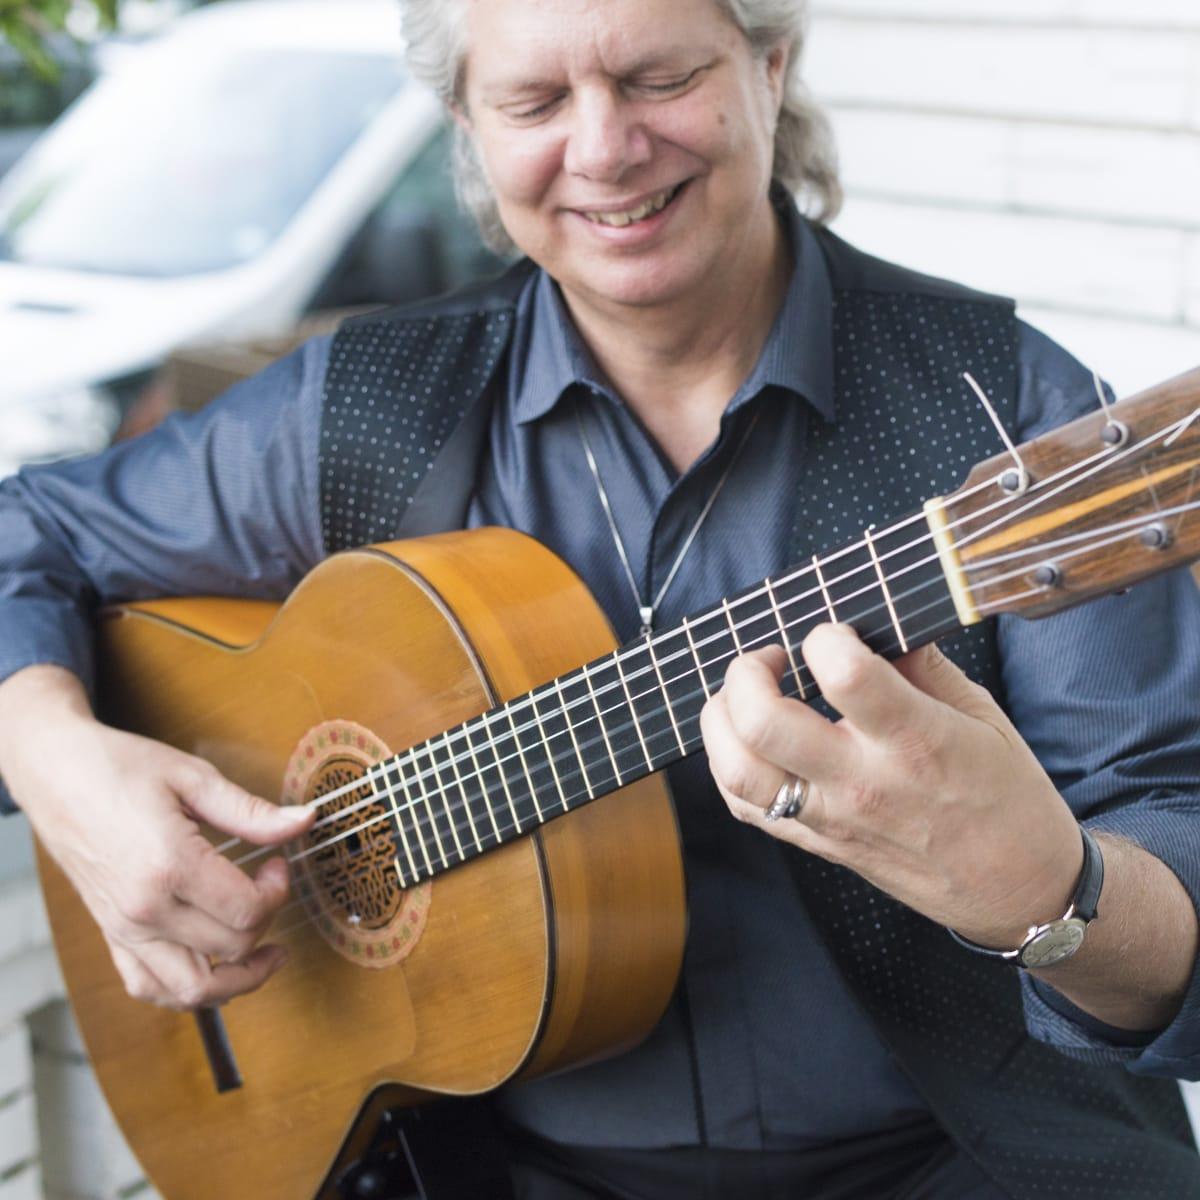 Guitarist Miguel Antonio